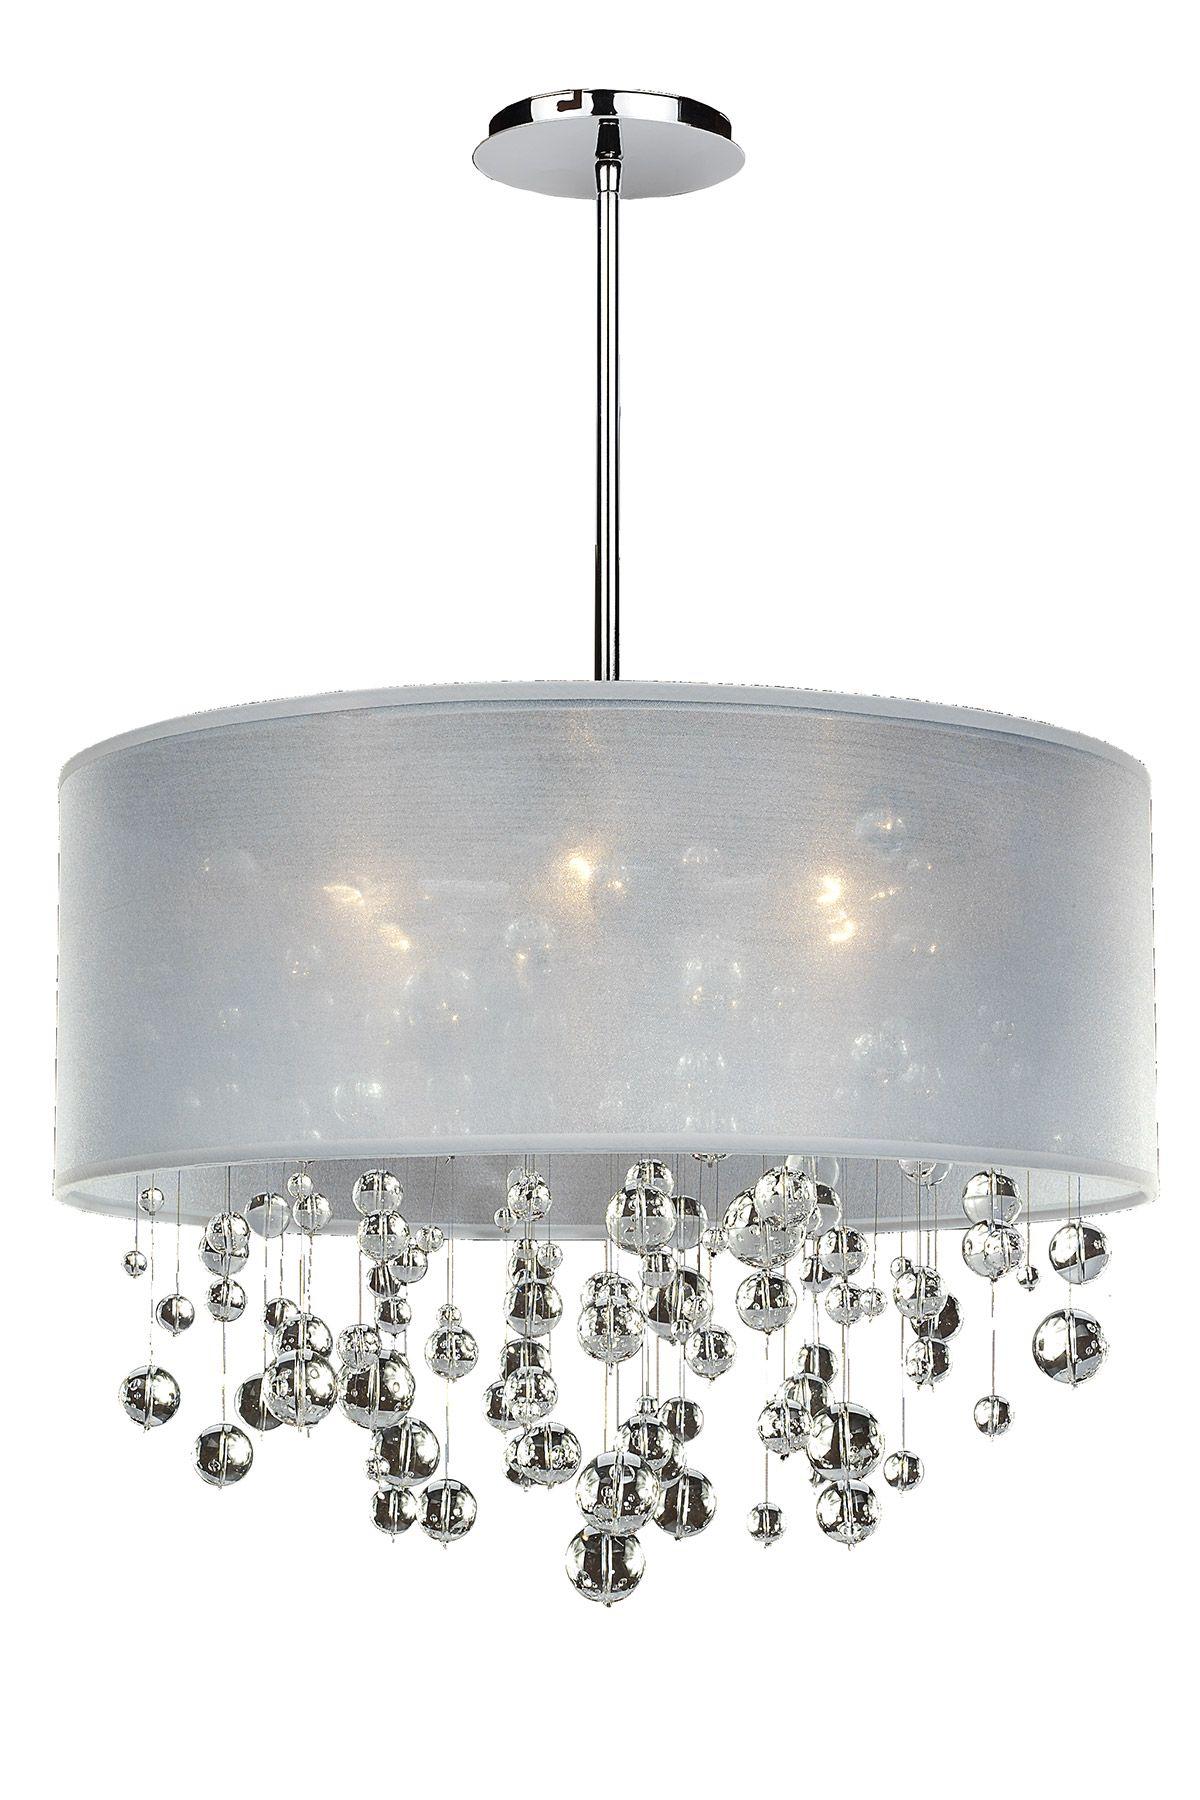 Silhouette Pendant By Glow Lighting 590bd21sp W 7c Pendant Chandelier Drum Chandelier Drum Shade